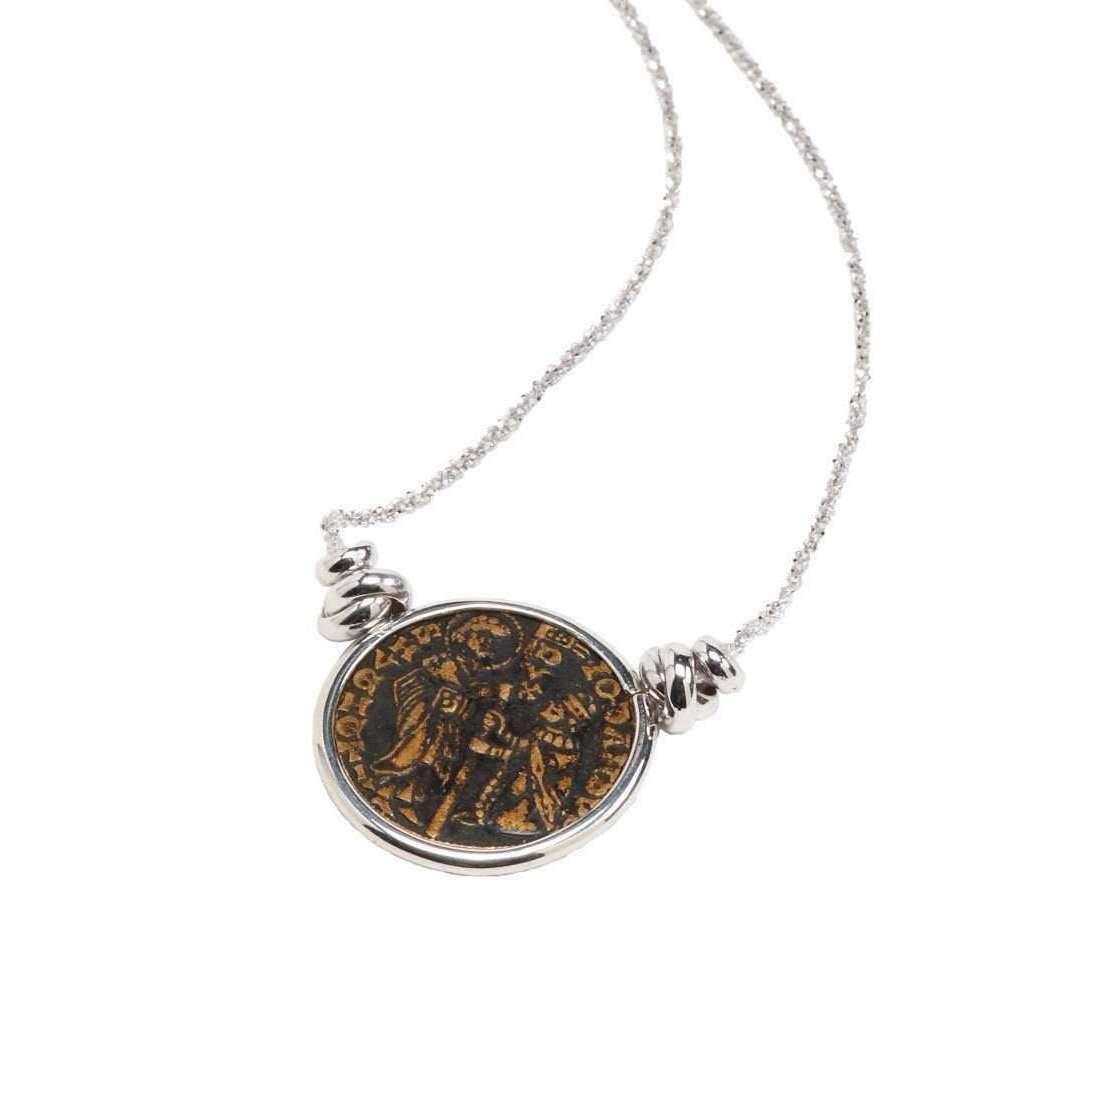 Rina Limor Sunrise Coin Pendant Necklace zURCVI6lB